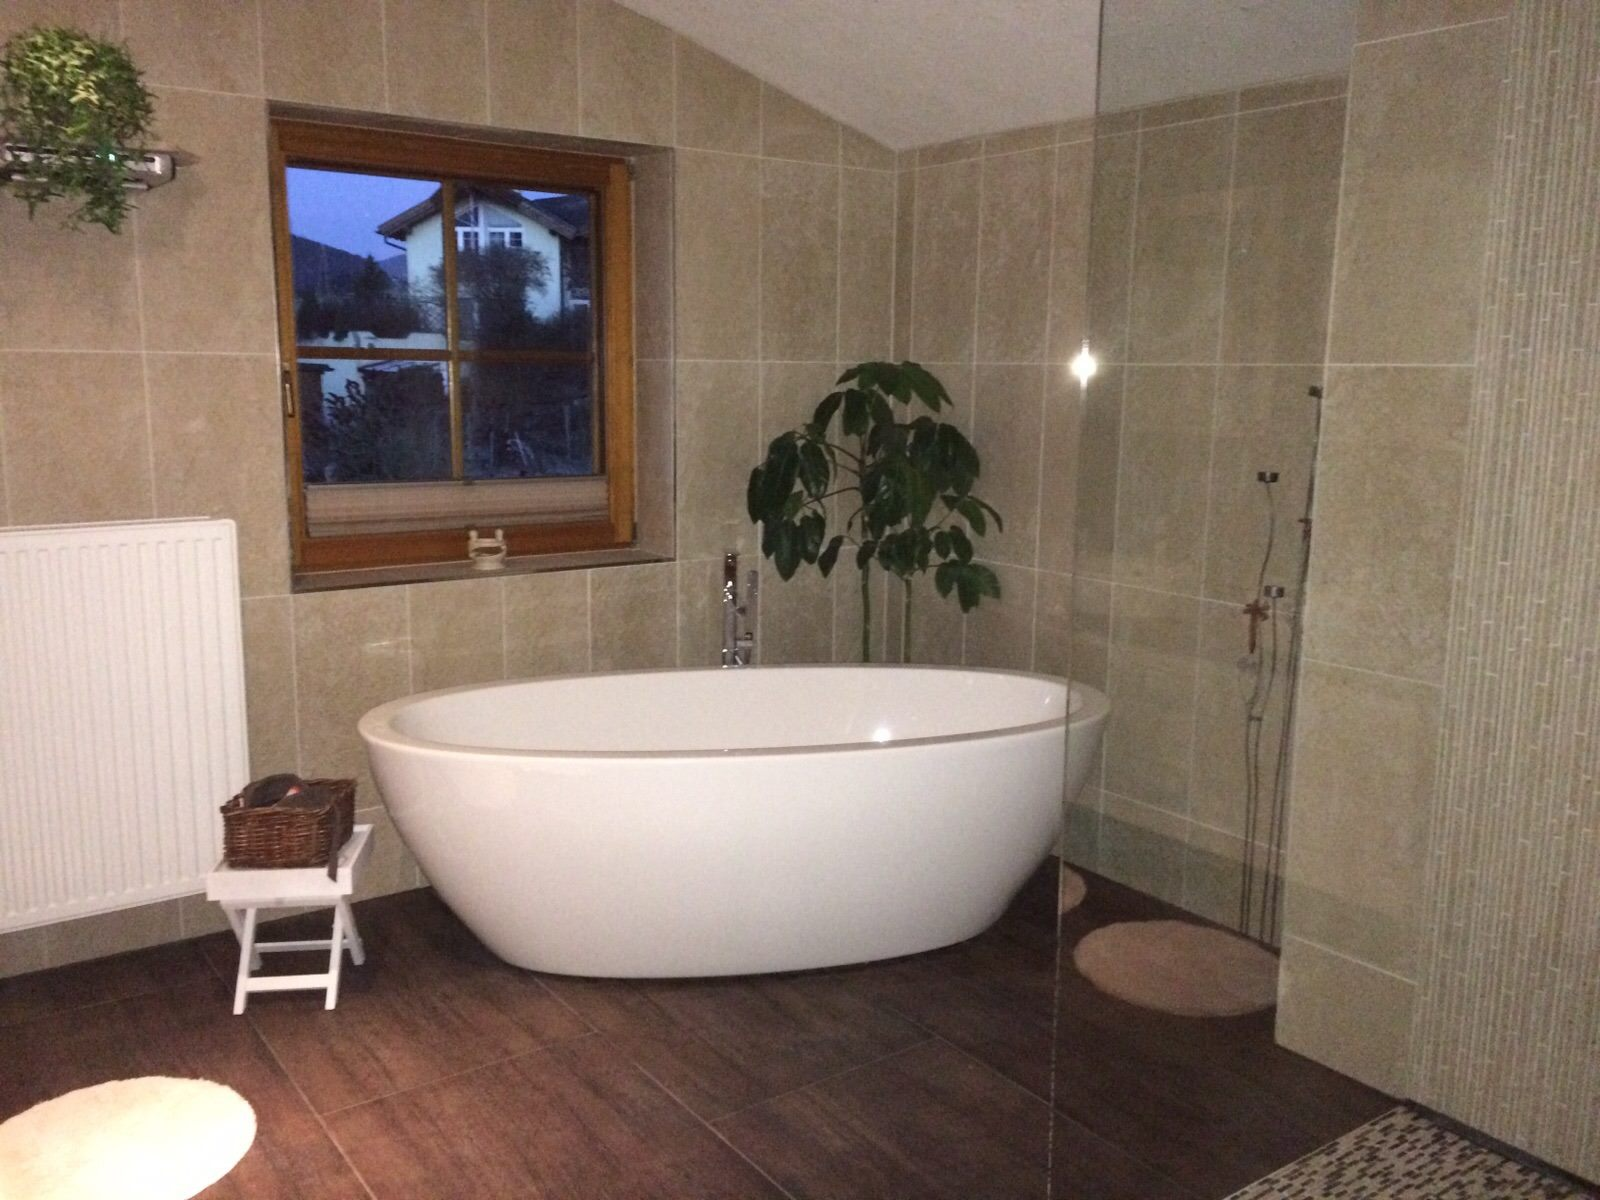 sanit re feininstallation badumbau wellnessbad meisterbetrieb installationen mair martin. Black Bedroom Furniture Sets. Home Design Ideas